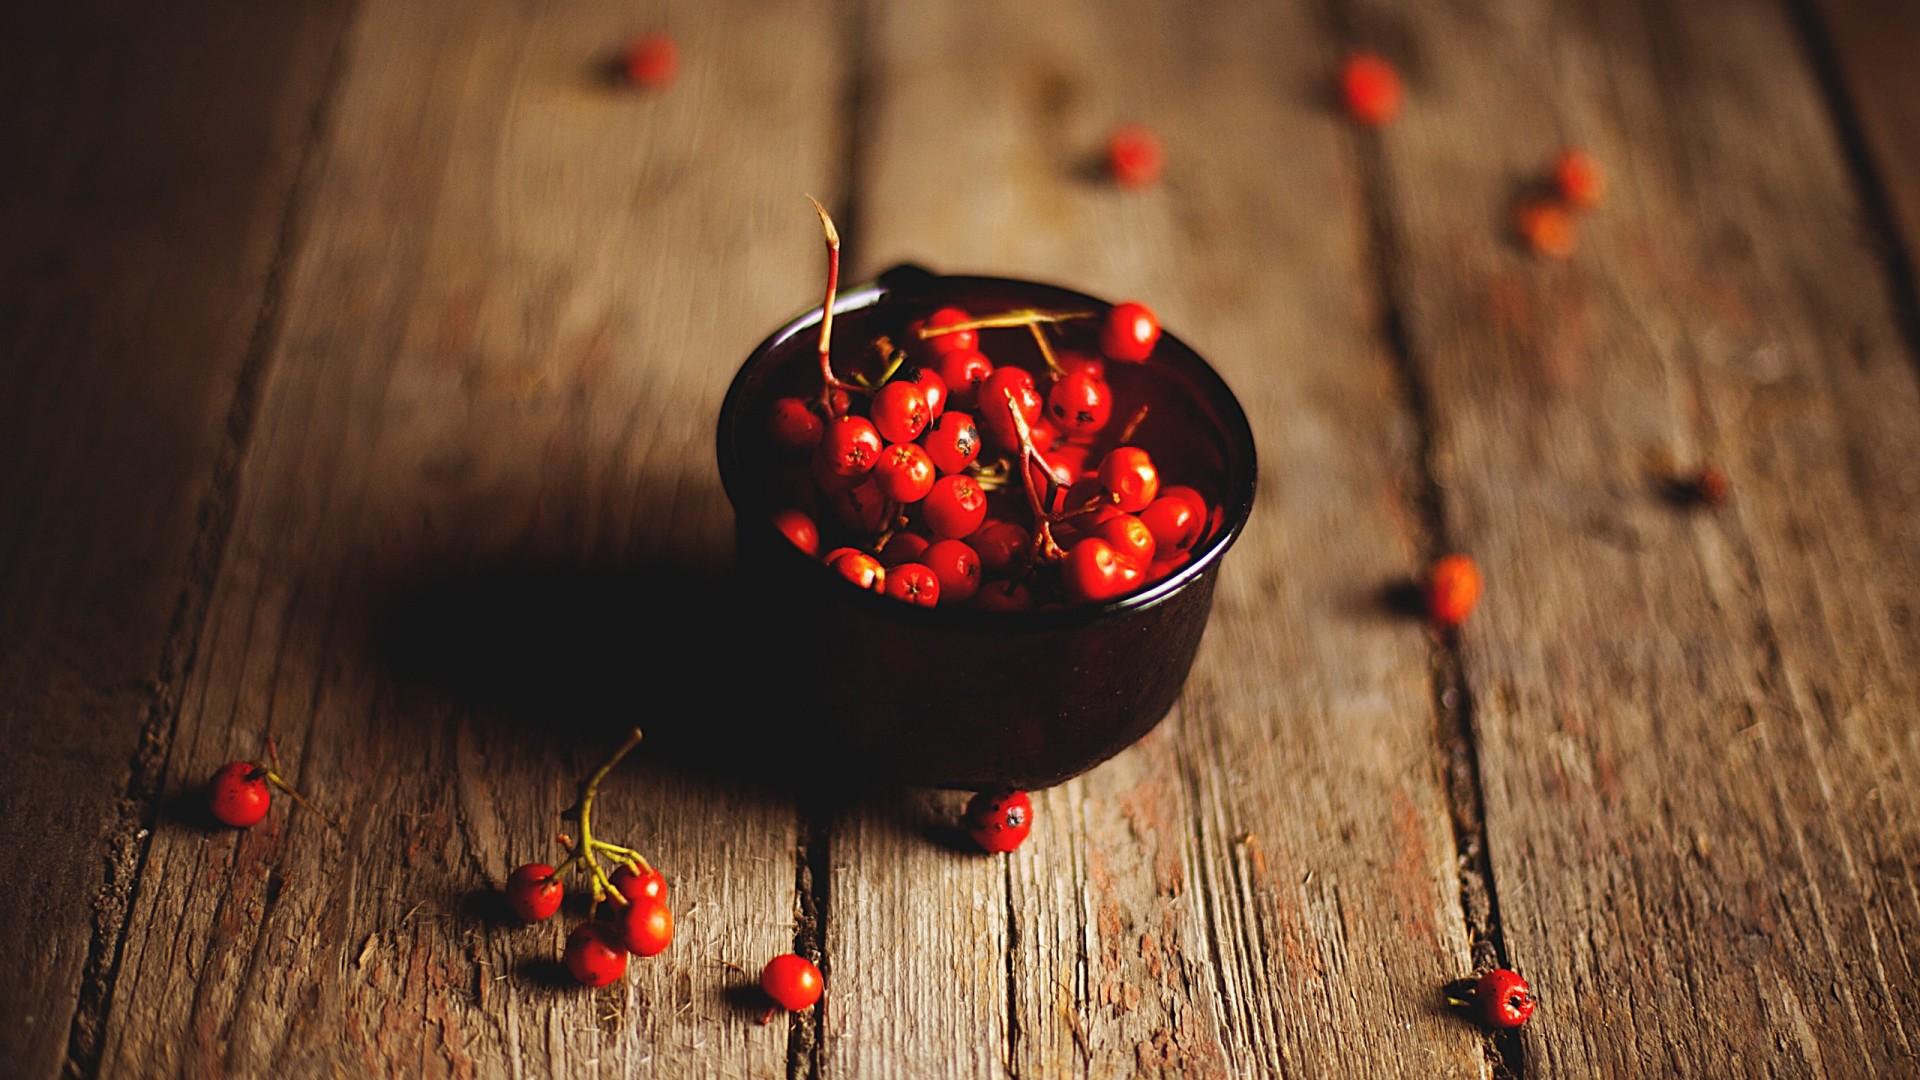 wood_fruits_food_macro_baskets_berries_blurred_background_1920x1080_33179.jpg